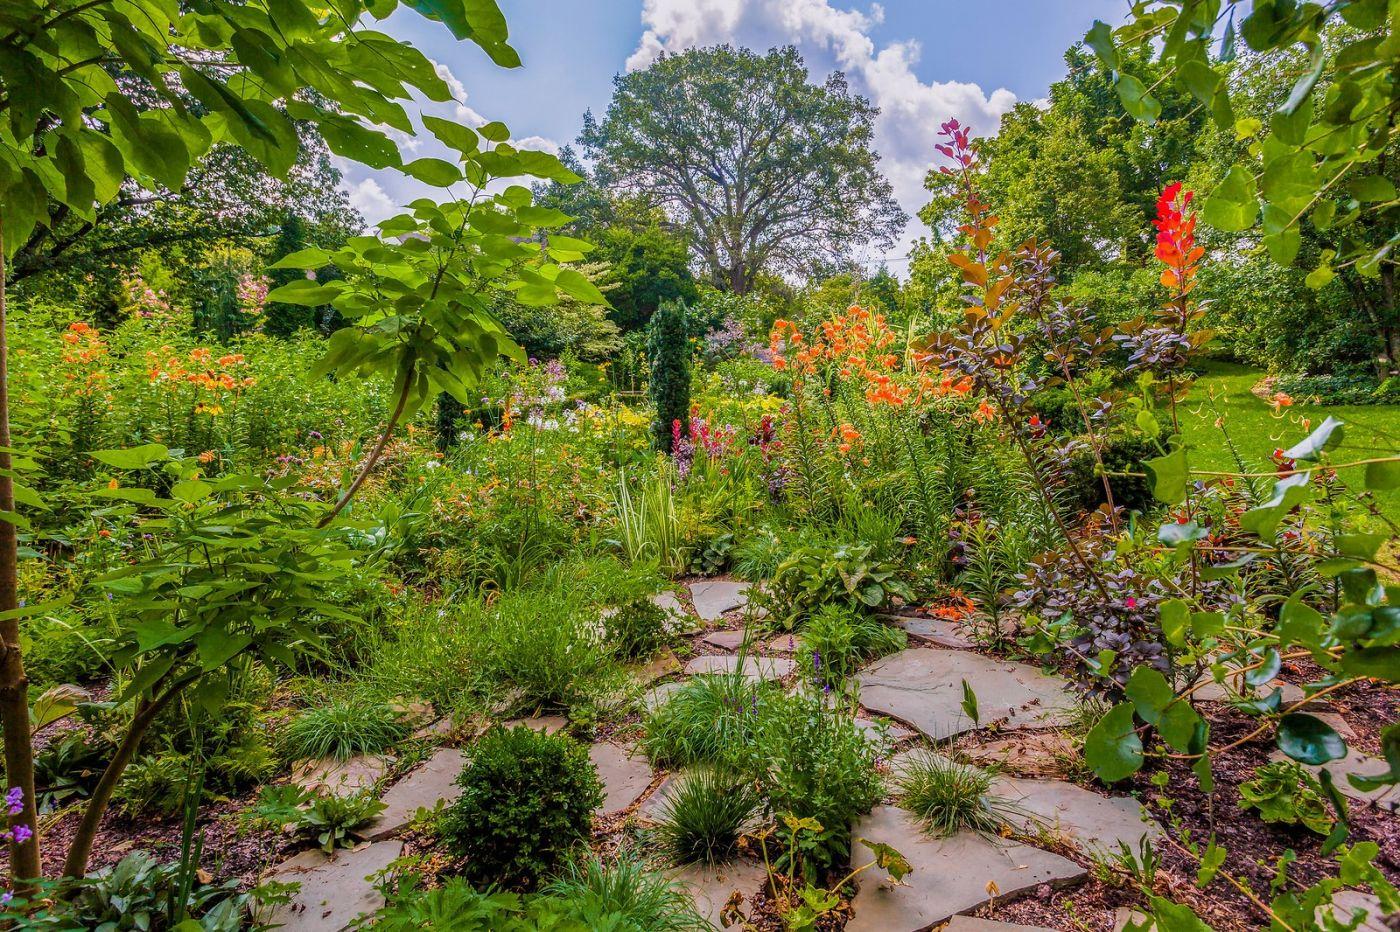 Chanticleer花园,春风得意_图1-15